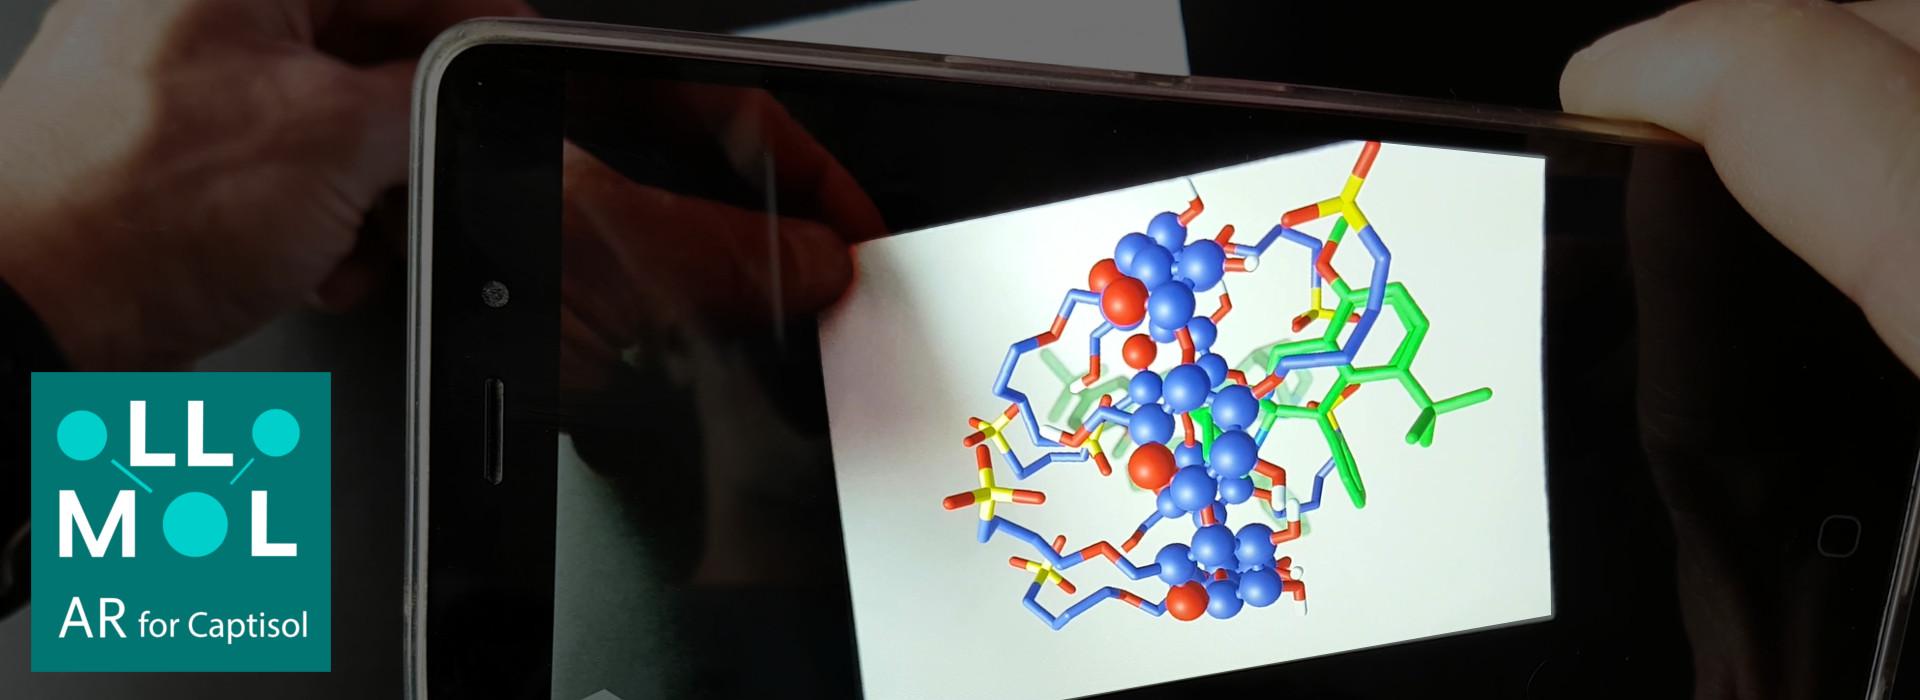 Ollomol AR for Captisol